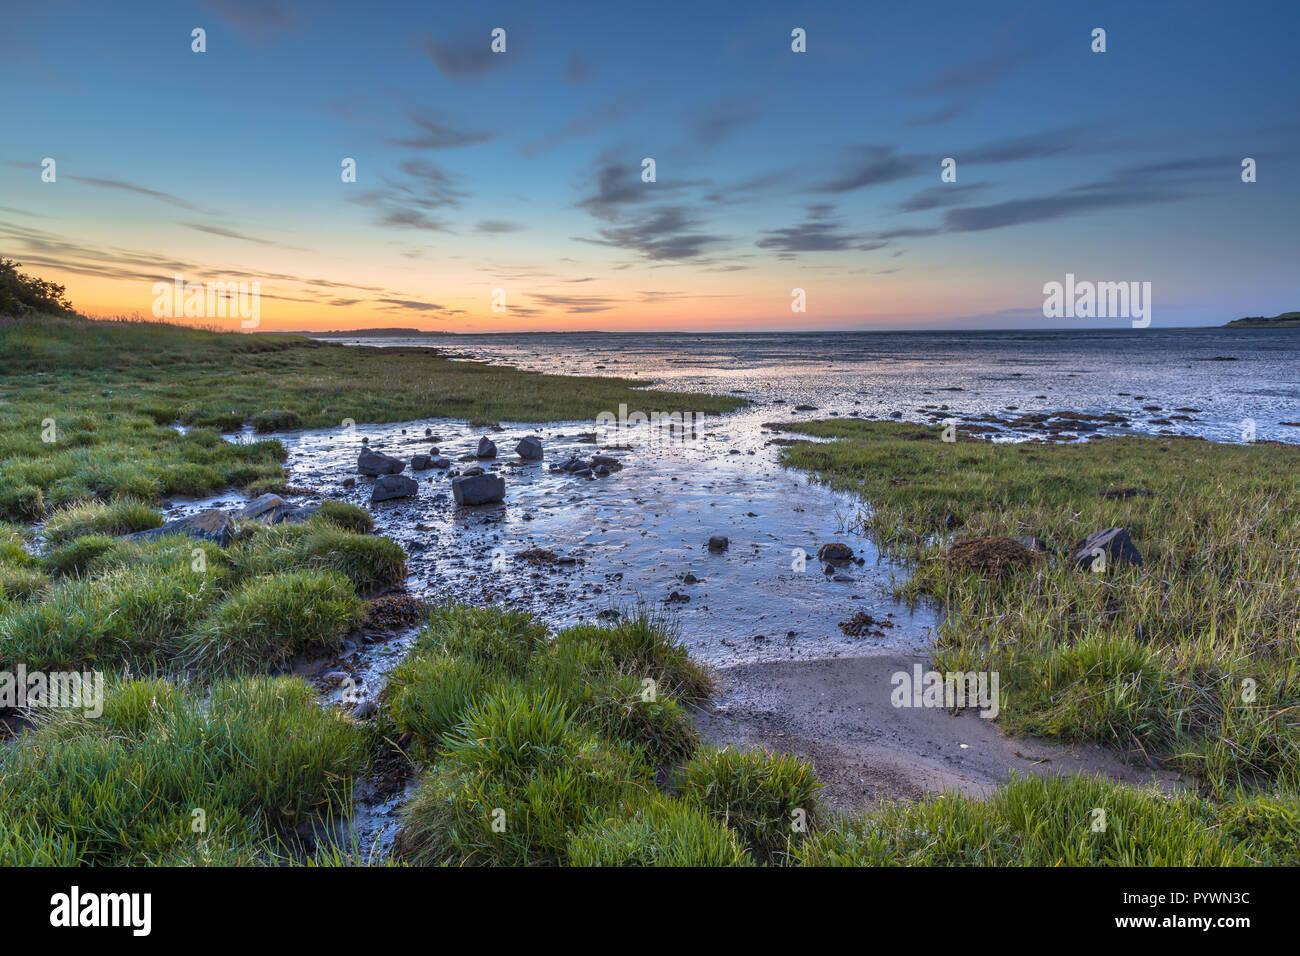 Tidal marsh Sea Inlet sunset at low tide near Waren mill, Northumberland, UK Stock Photo